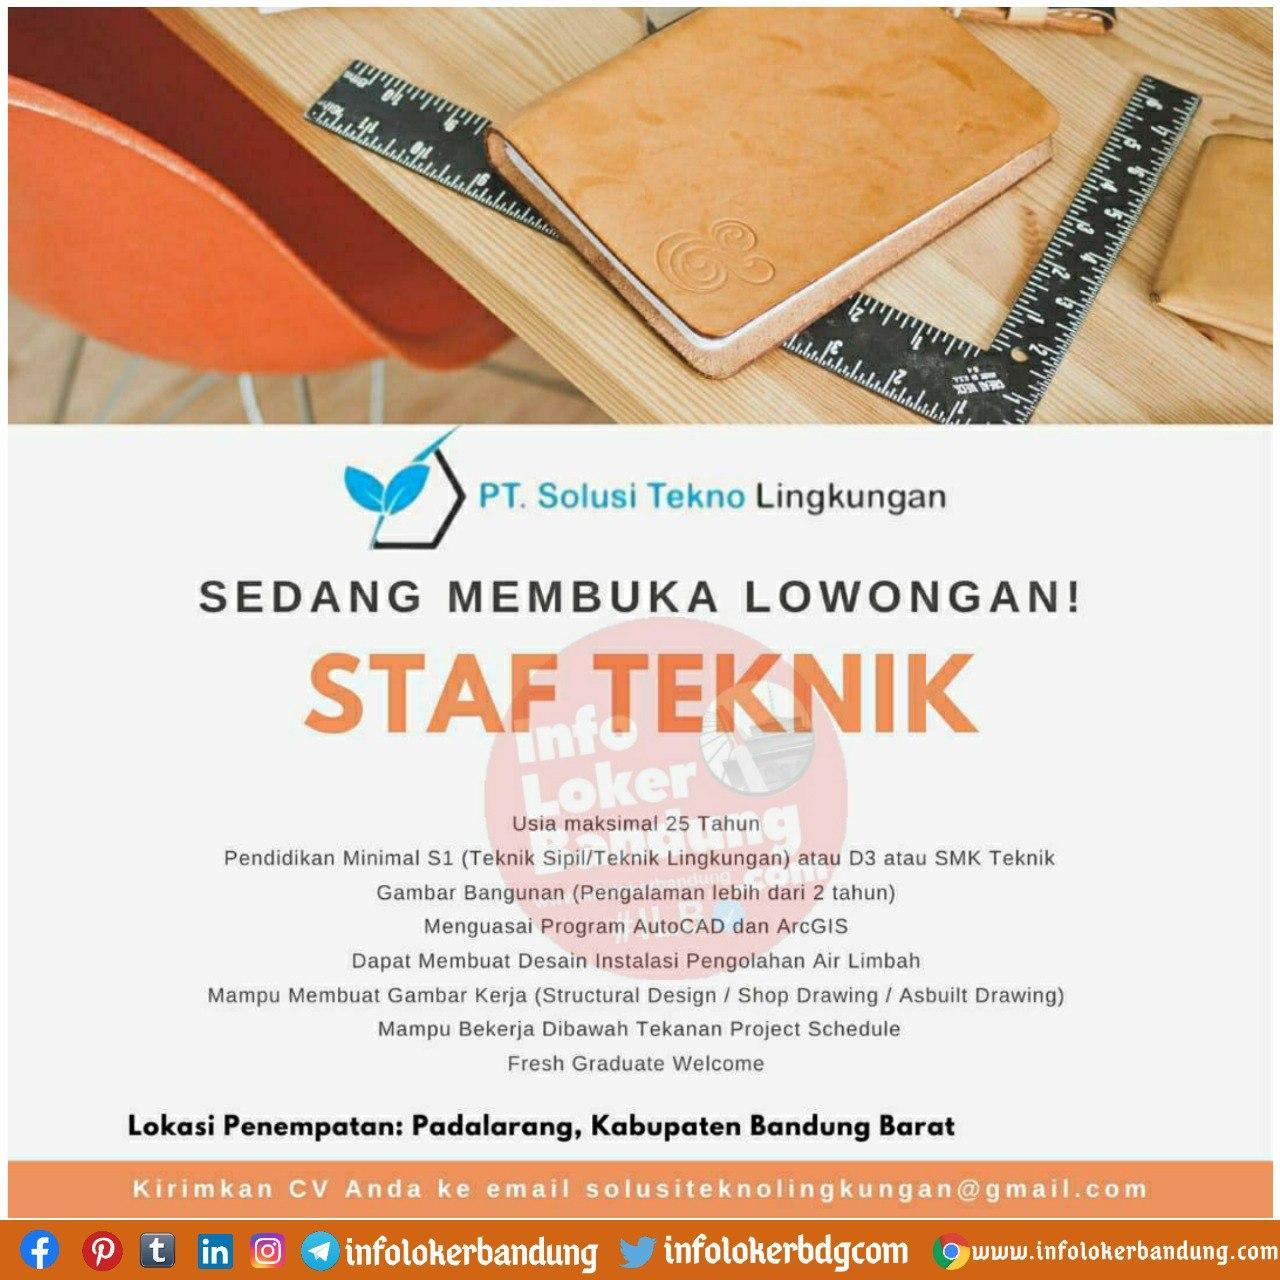 Lowongan Kerja PT. Solusi Tekno Lingkungan Bandung Oktober 2020